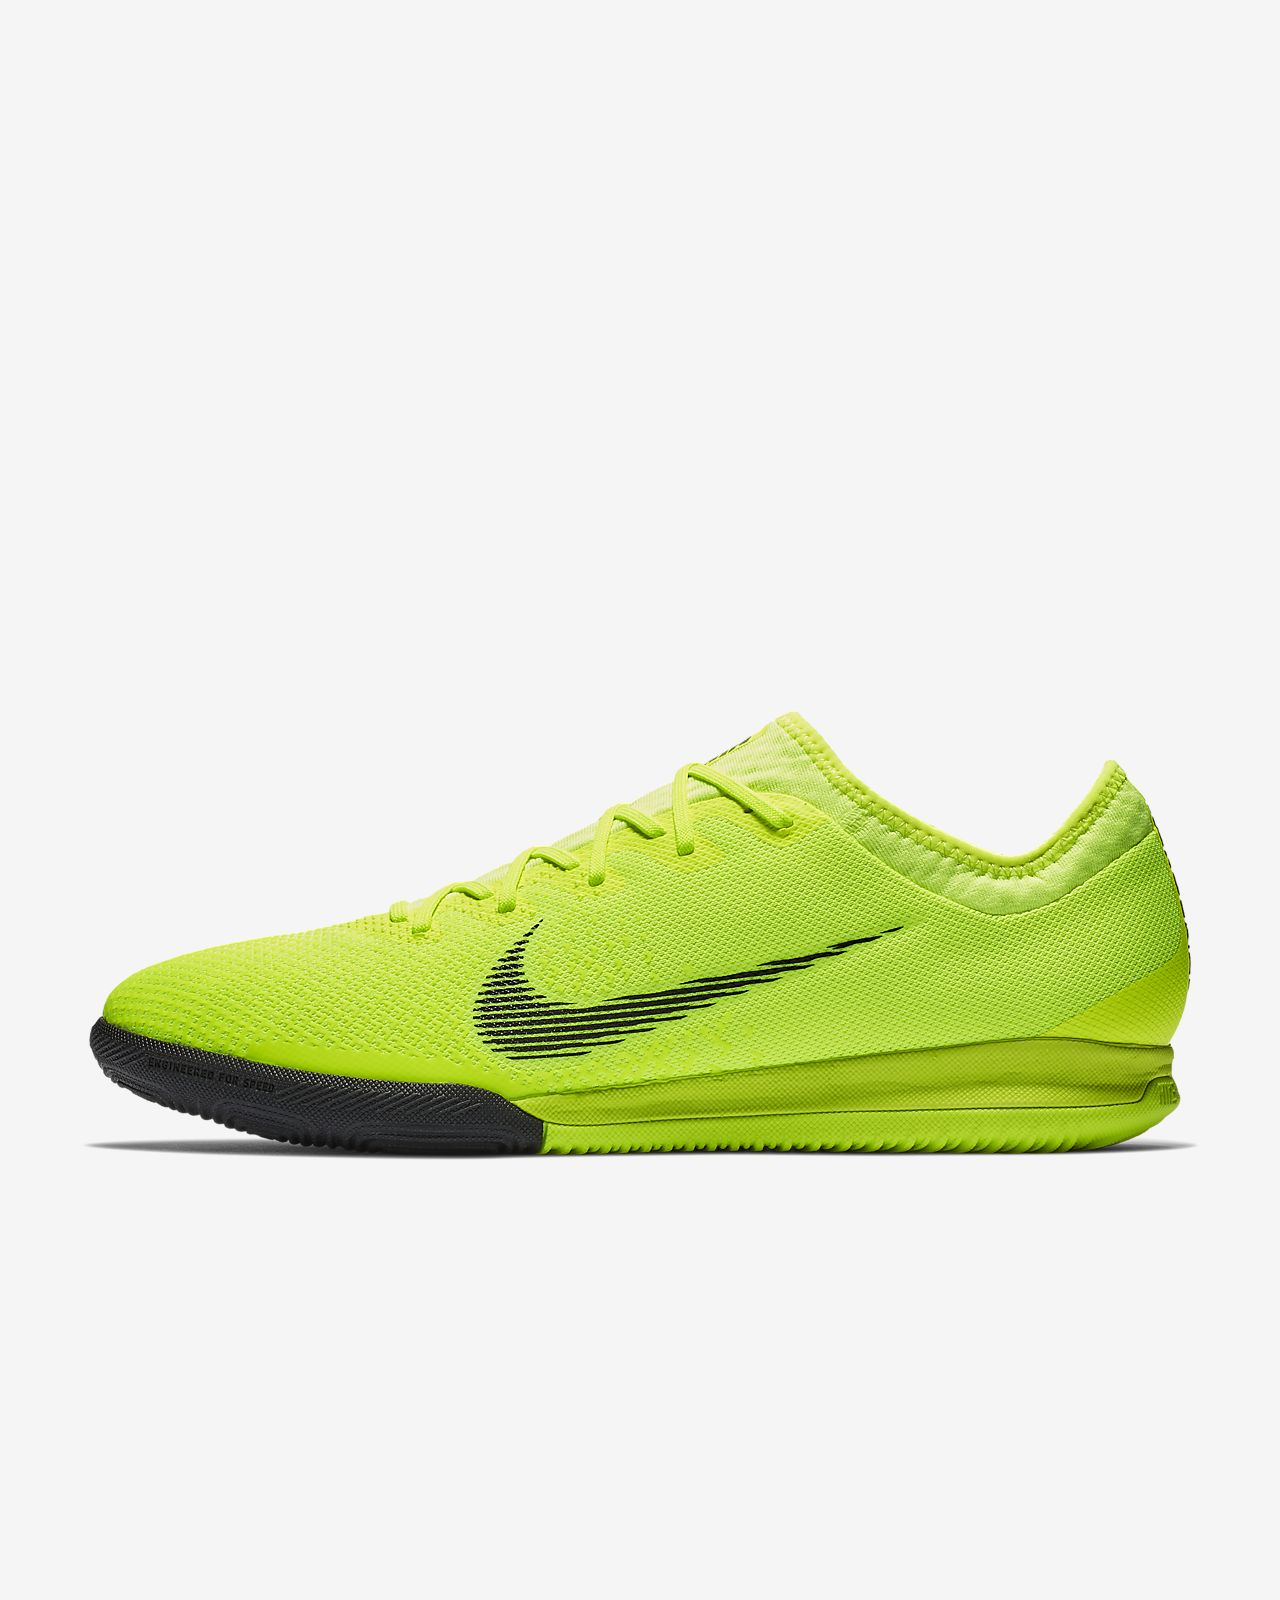 Nike Mercurialx Vapor Xii Pro Indoorcourt Football Shoe Nikecom Si